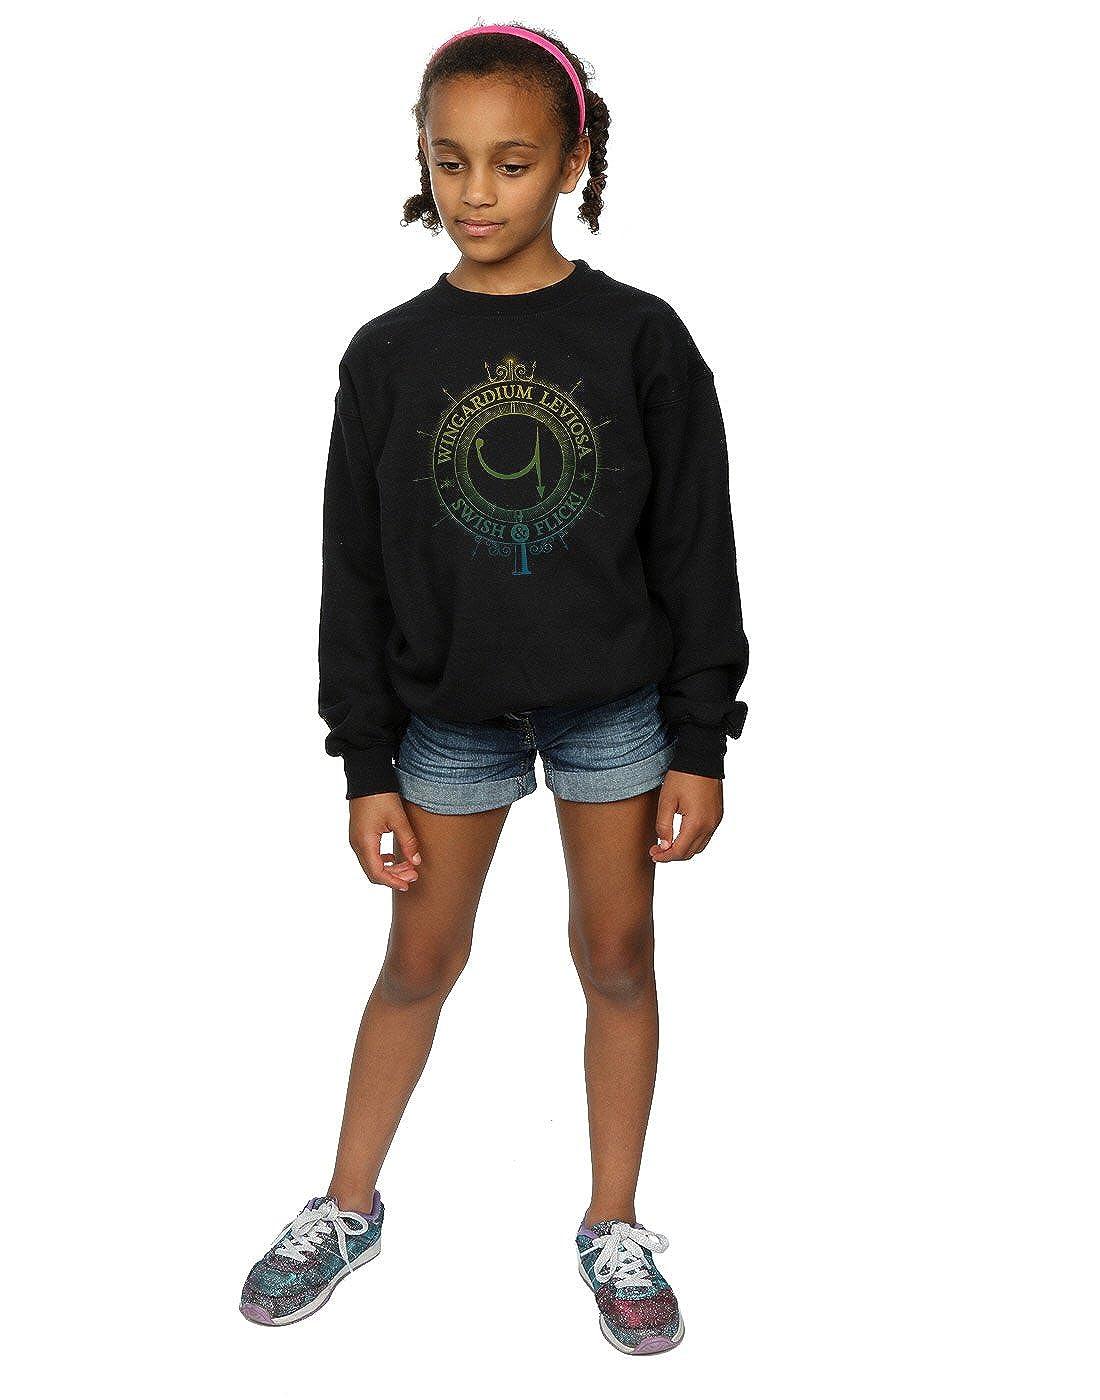 Harry Potter Fille Wingardium Leviosa Spells Charms Sweat-Shirt 9-11 Years Noir